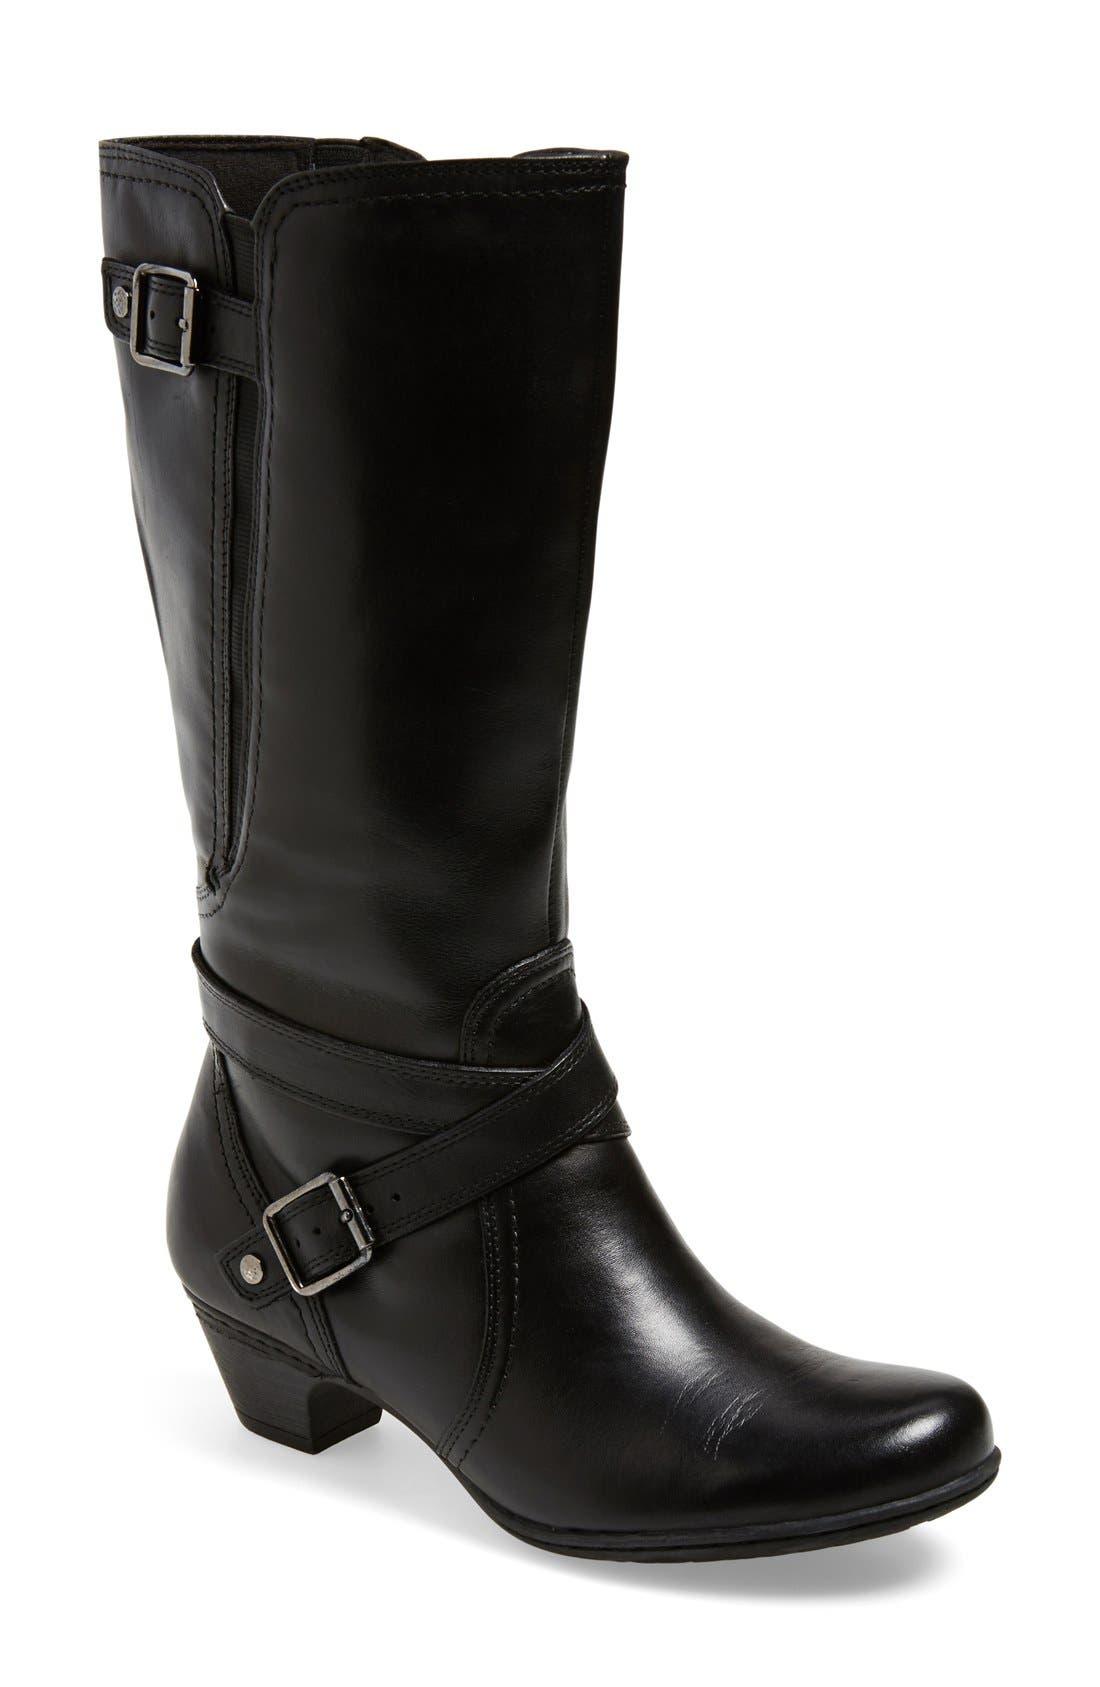 Main Image - Rockport Cobb Hill 'Ashlyn' Tall Boot (Women)